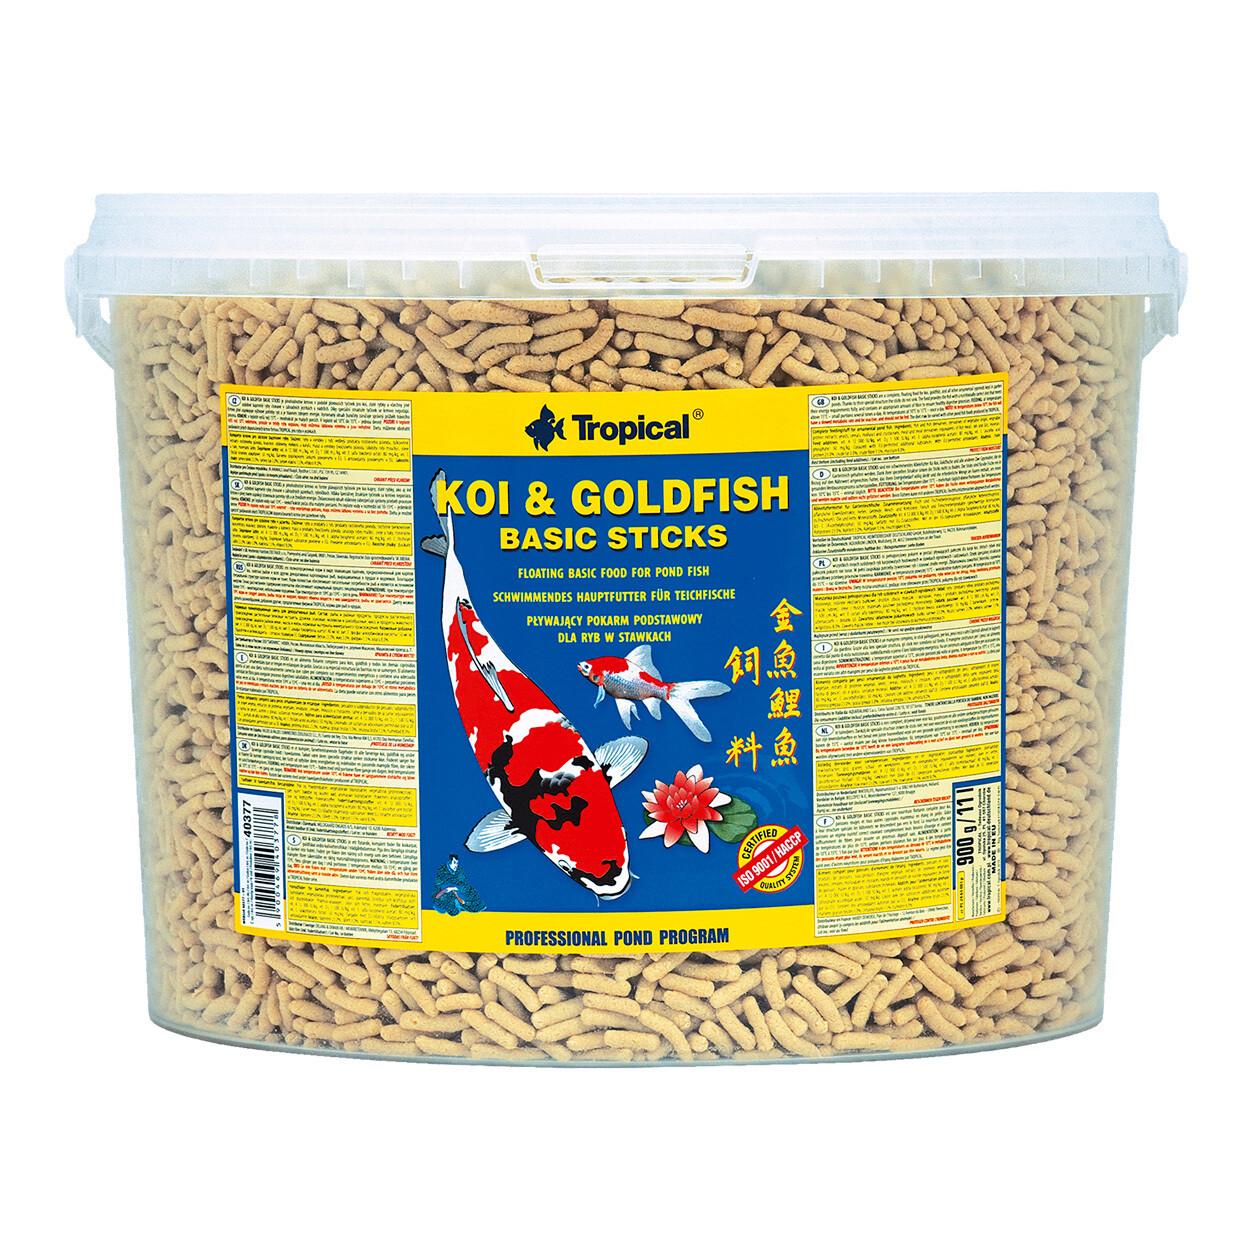 Tropical Koi & Goldfish Basic Sticks 900g